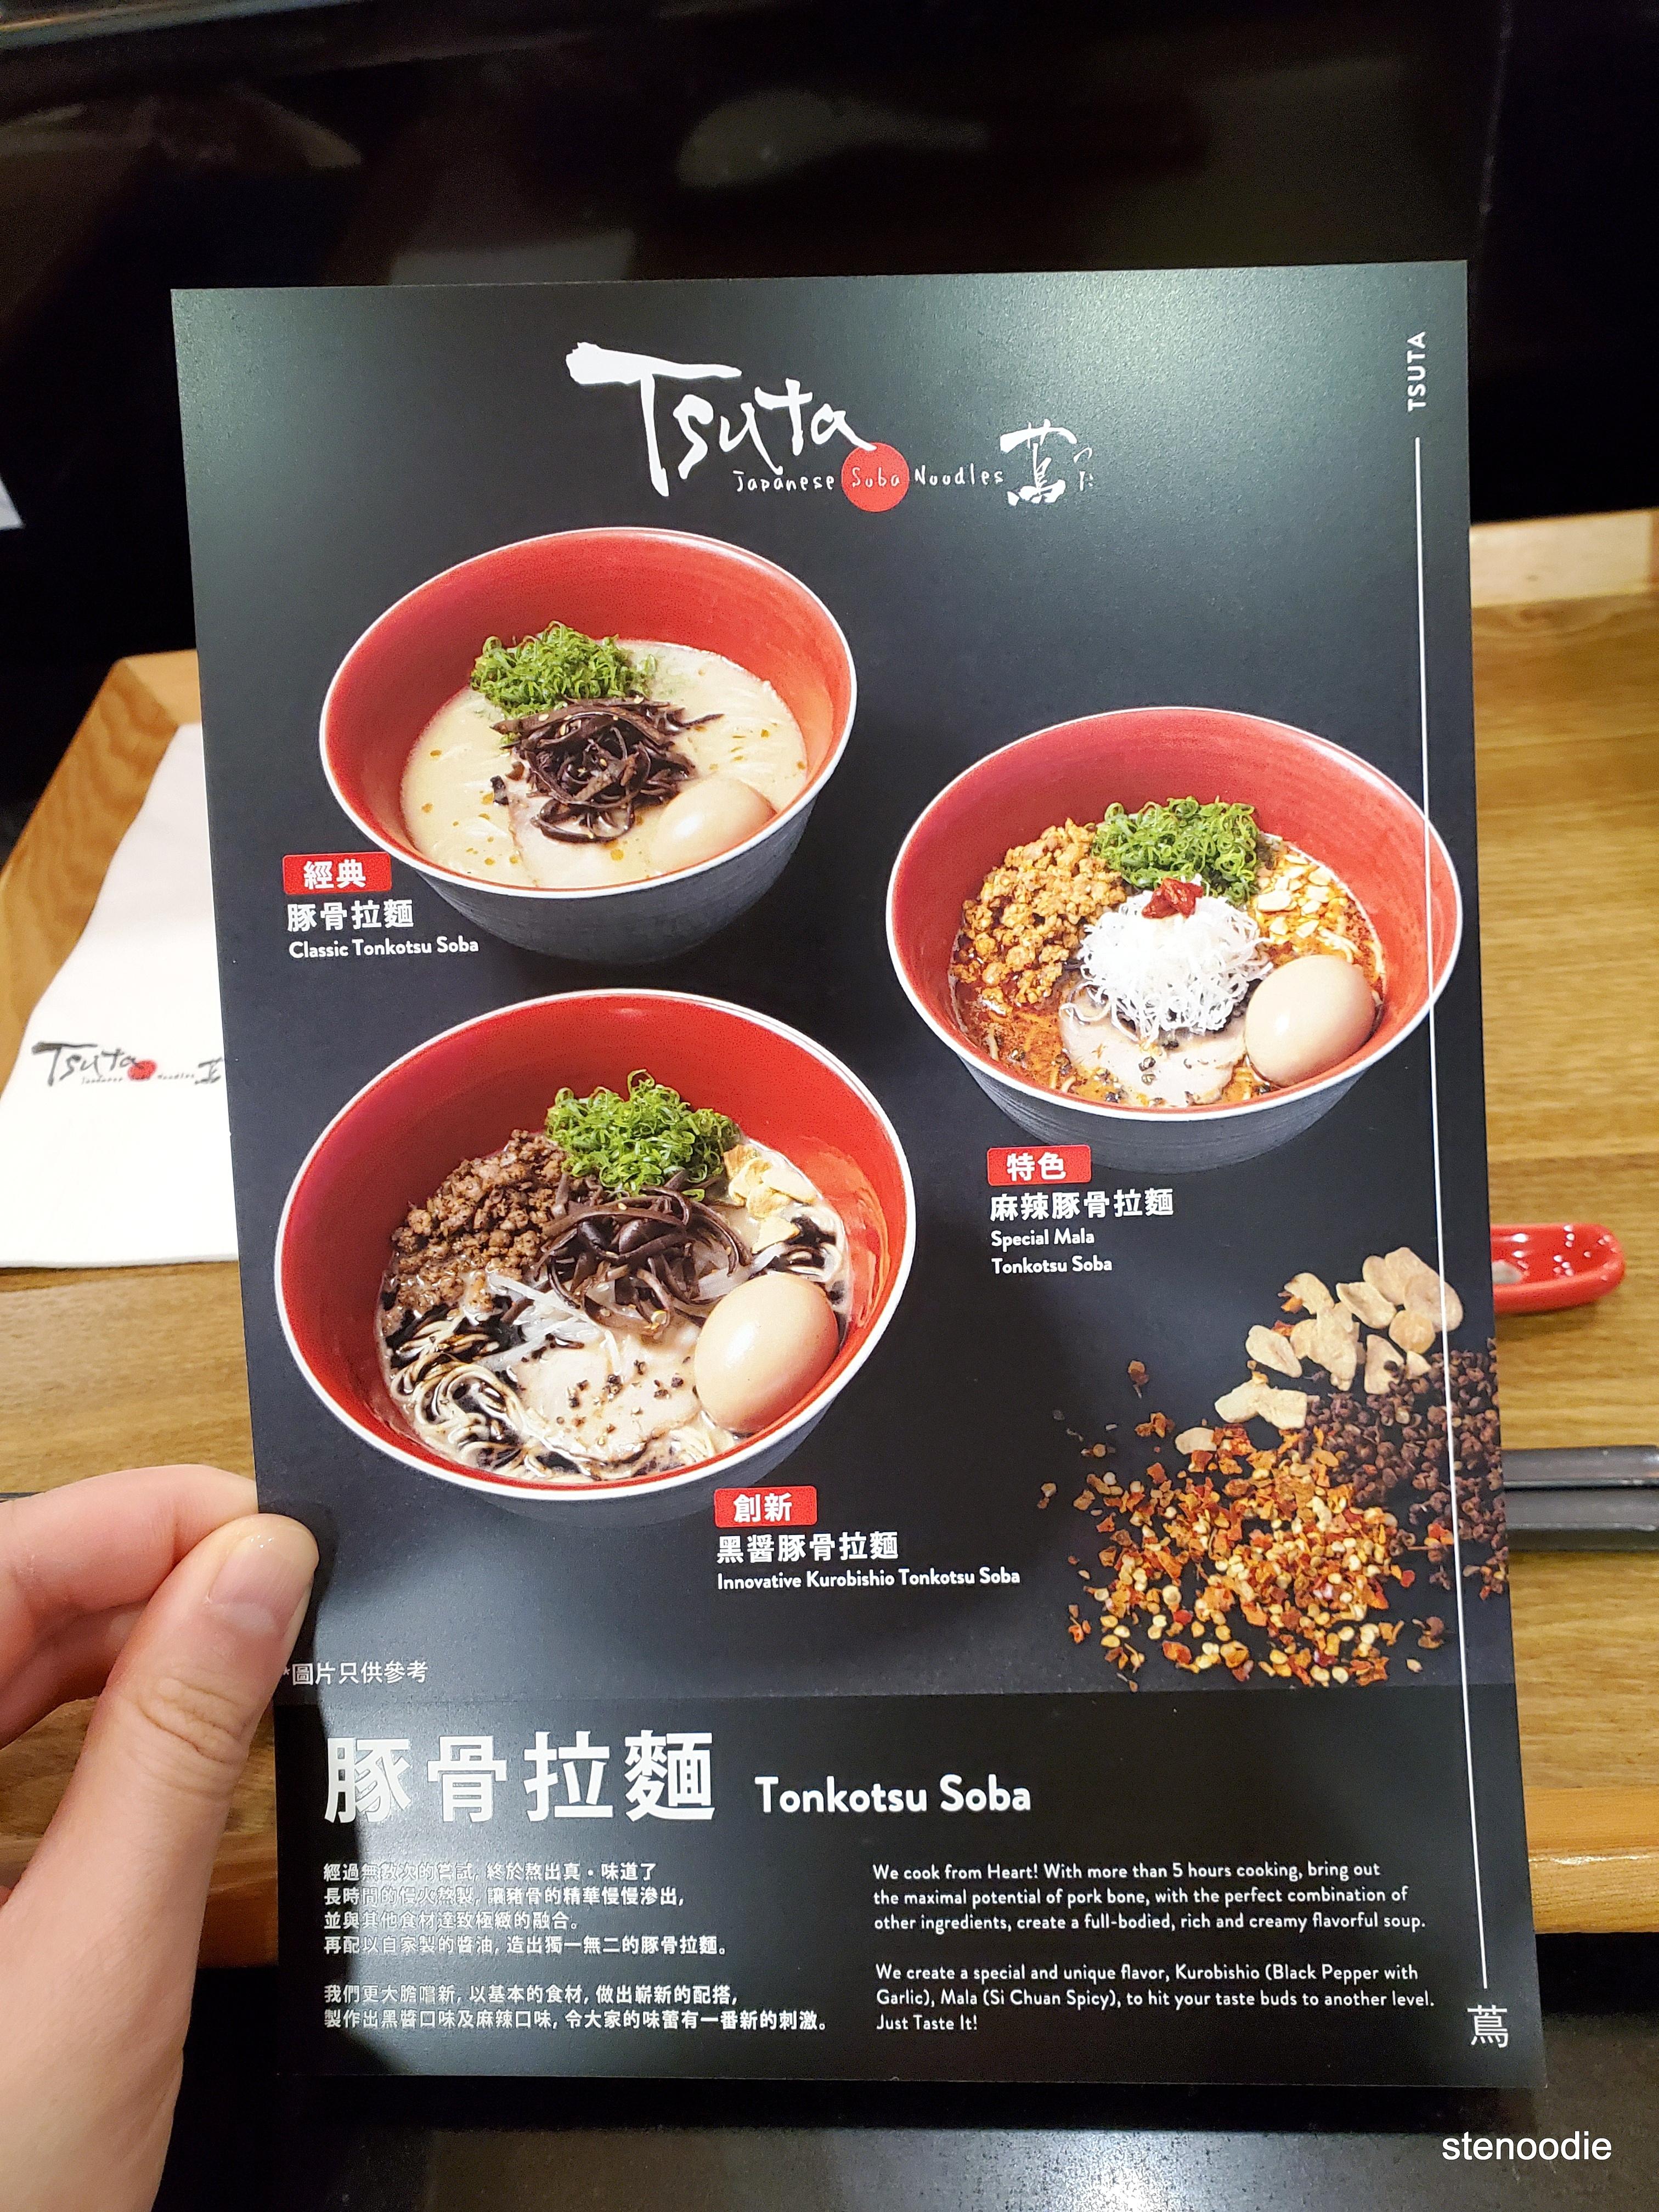 Tsuta Harbour City menu and prices